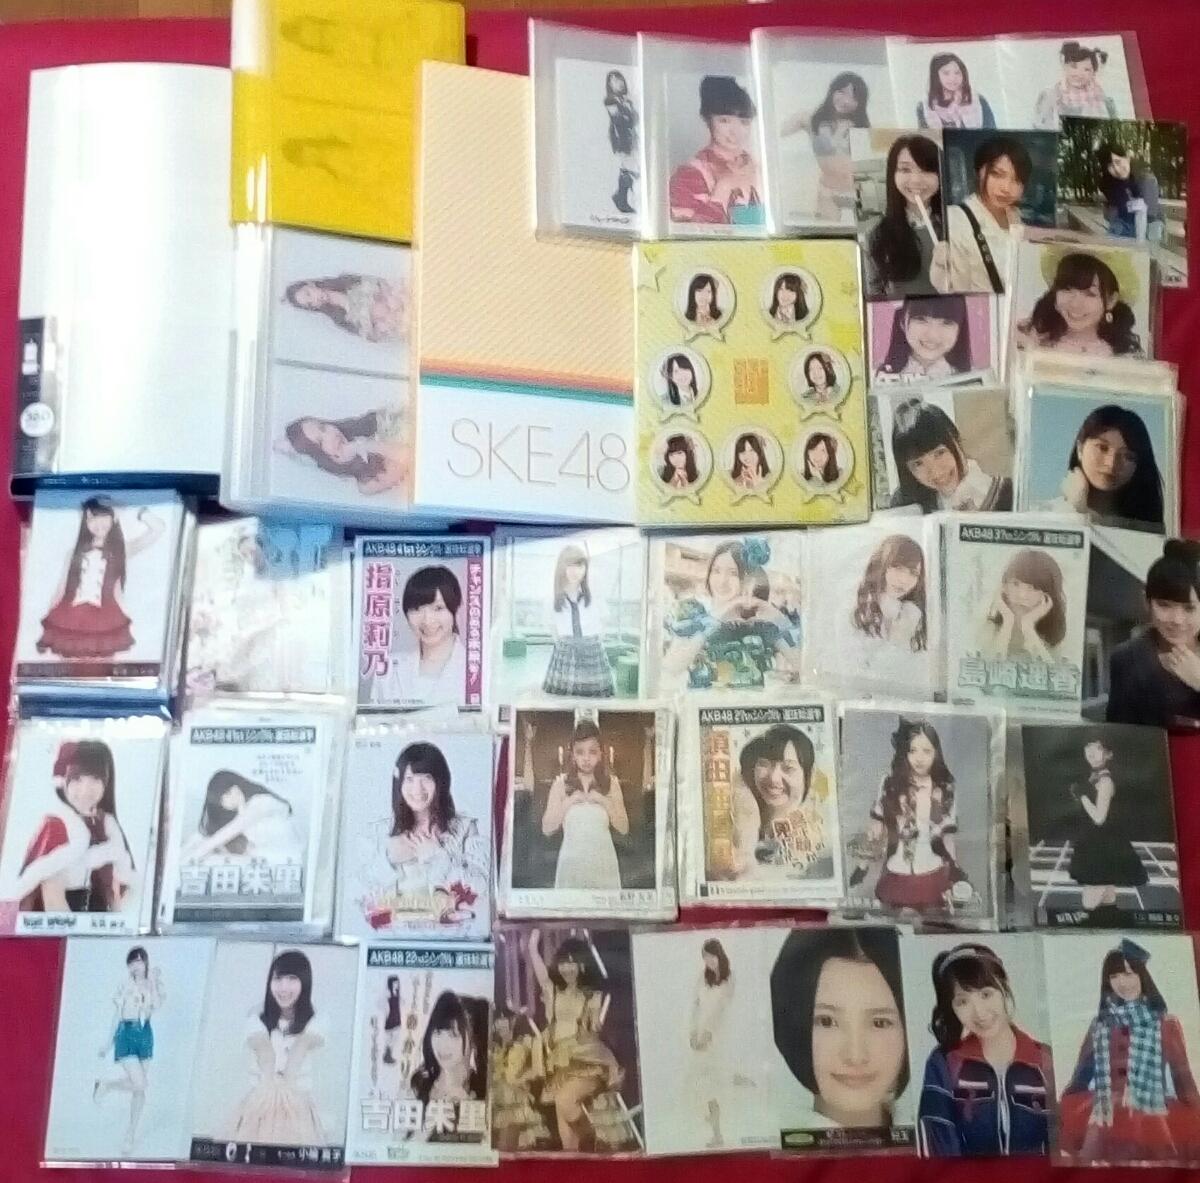 AKB48 公式生写真約1300枚セットまとめ売り コンプ復刻版 共通ポーズ 北原里英 大島優子 松井珠理奈 指原莉乃 SKE/NMB/HKT/NGT/STU/チーム8